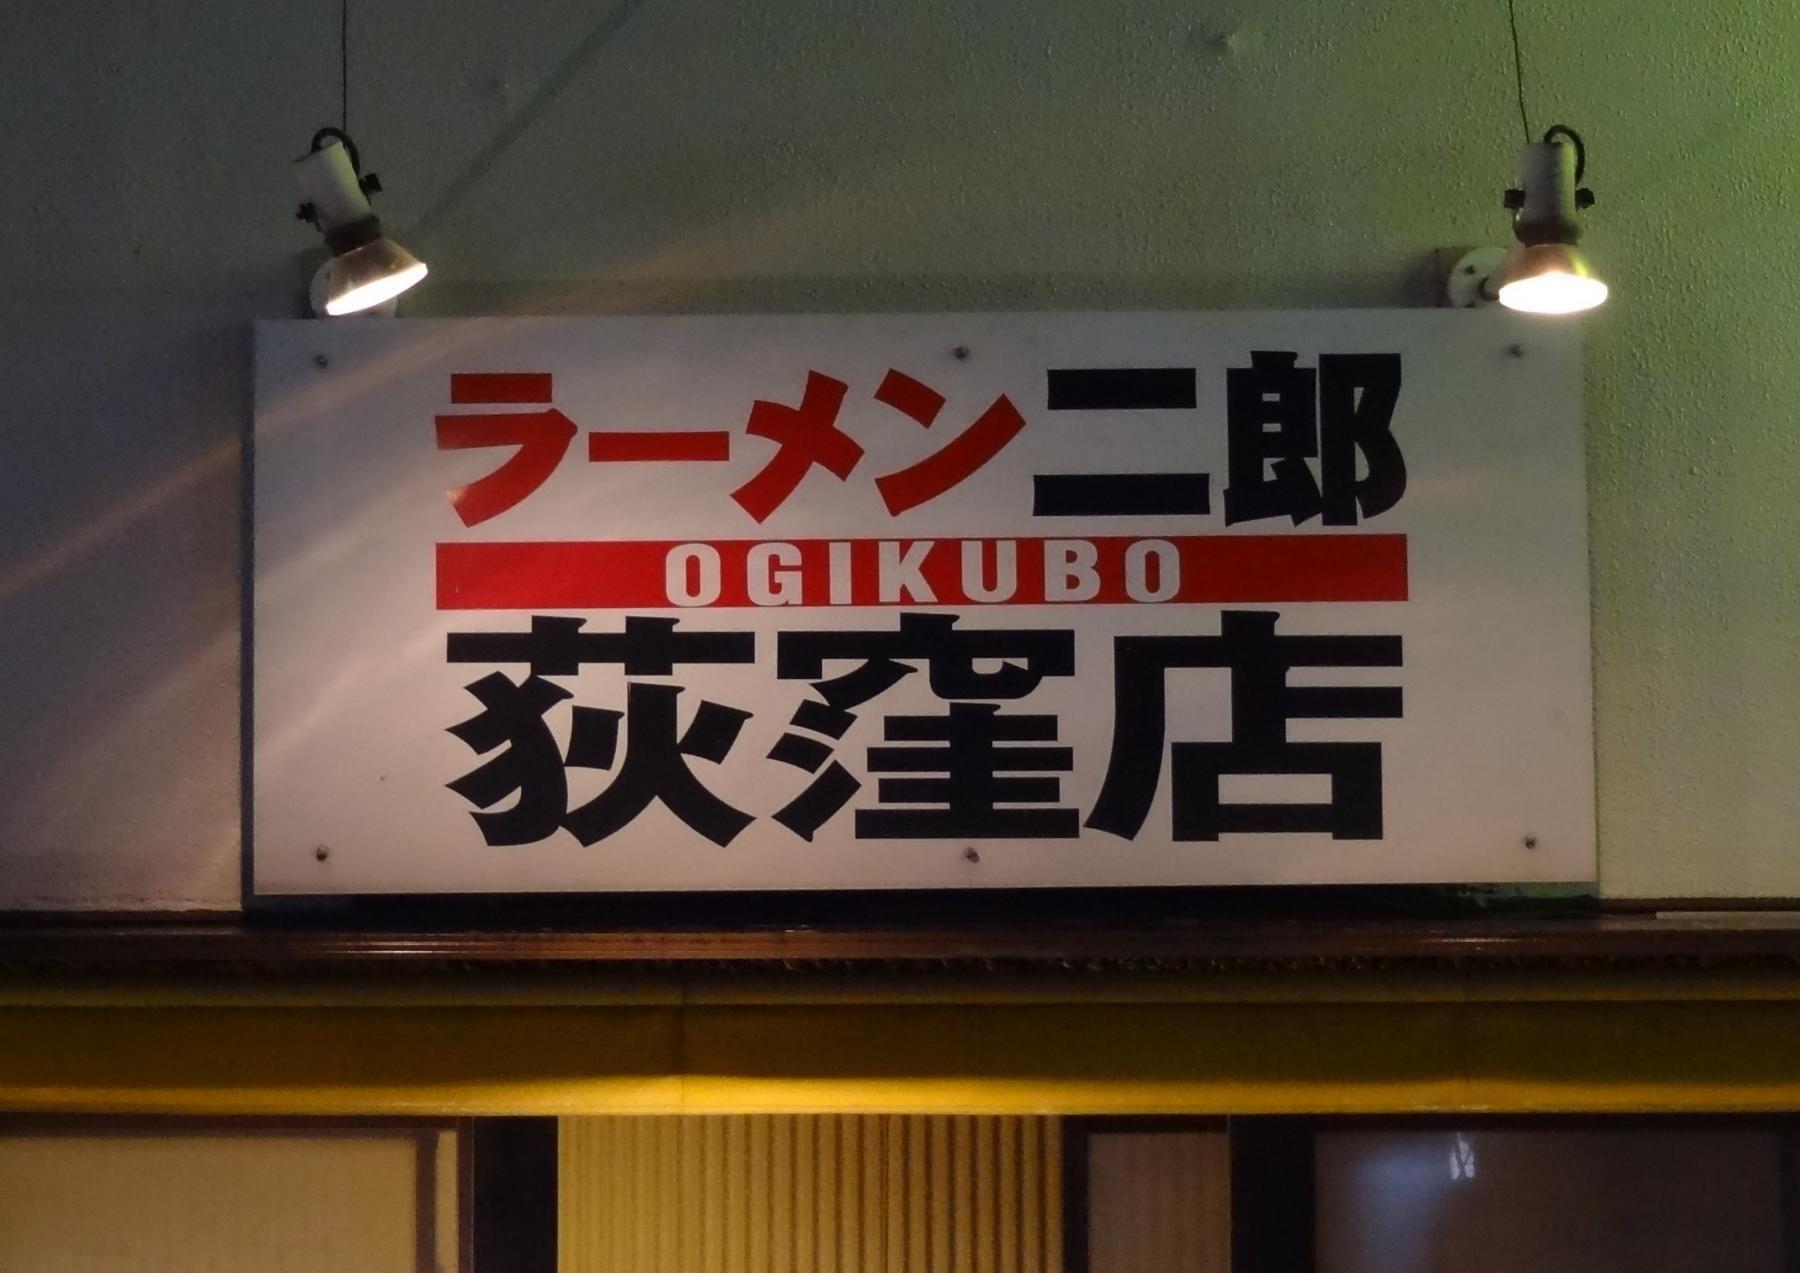 20120612001ogikubo.jpg